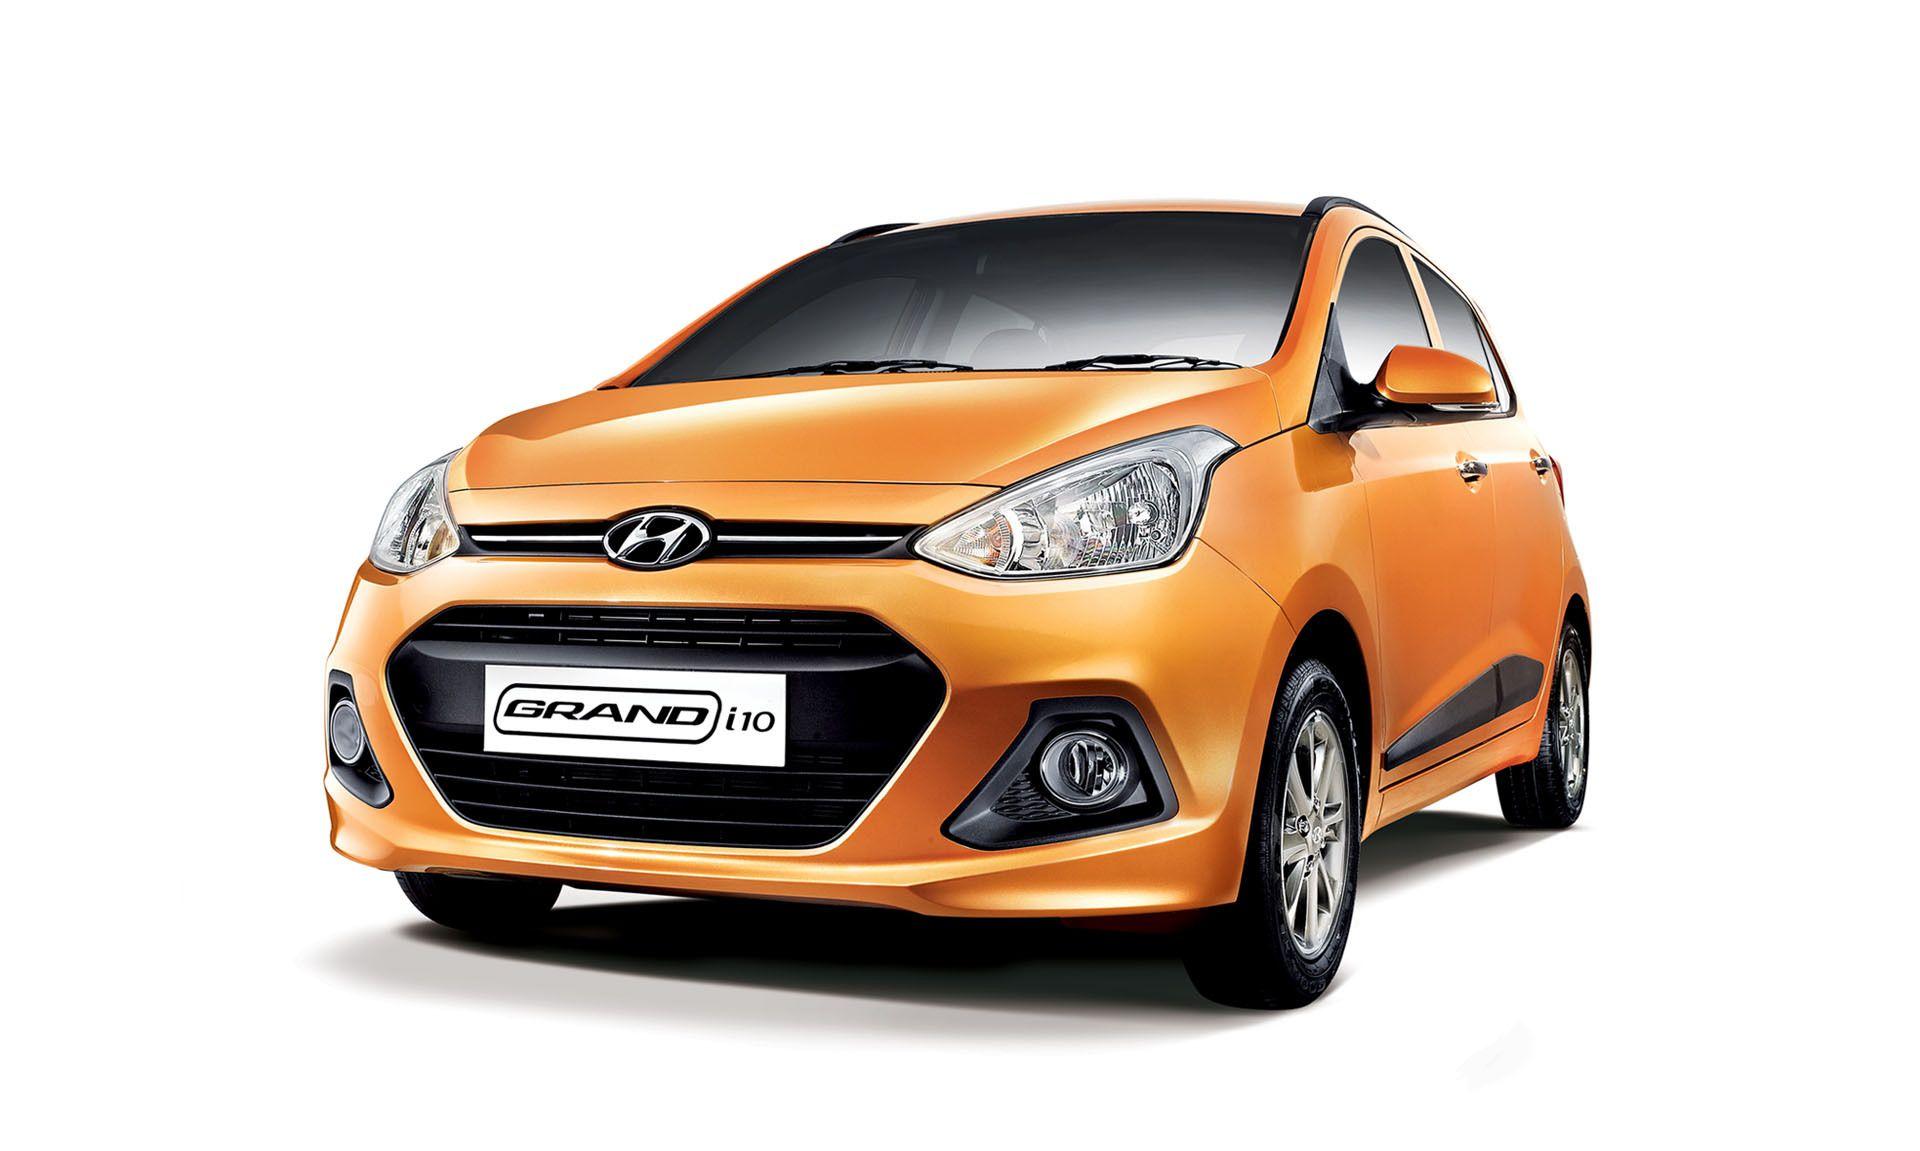 Hyundai Grand i10 Automatic Exteriors Overall